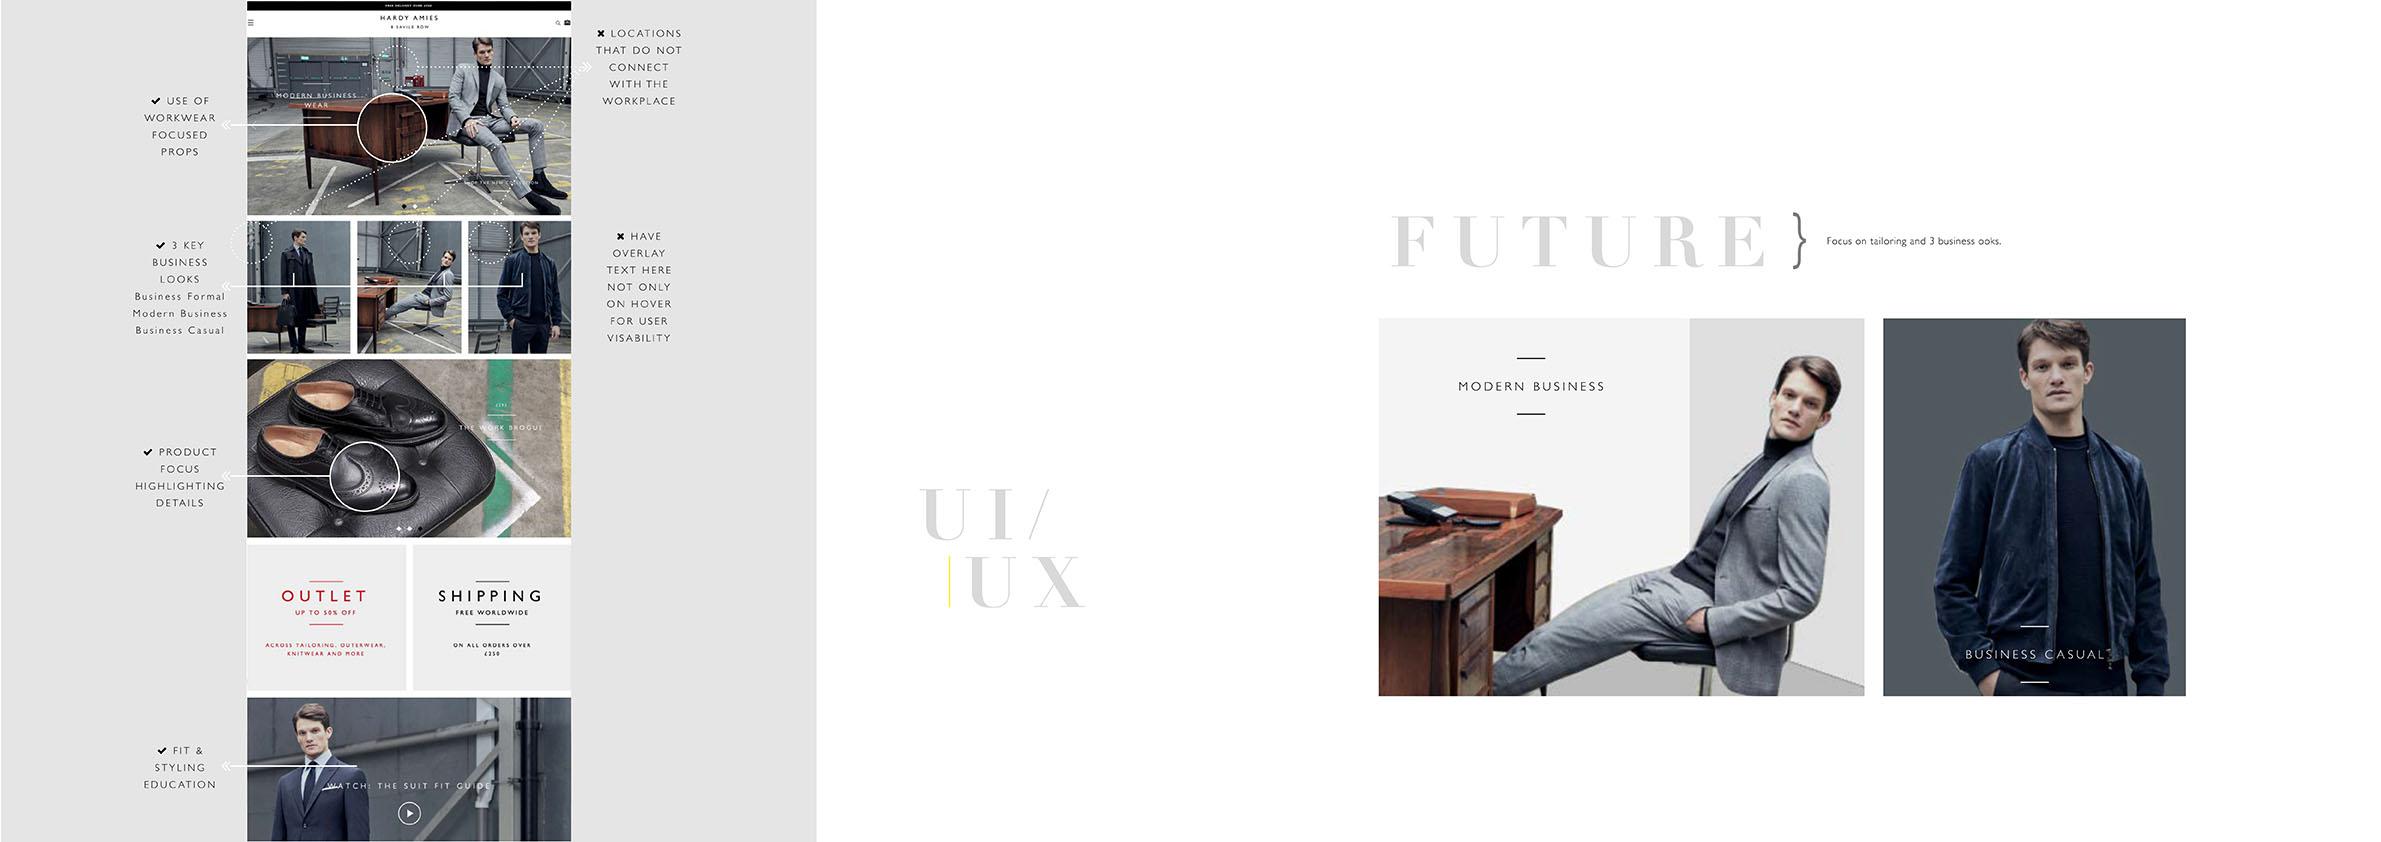 lauren-grace-design-freelance-london-art-direction-fashion-menswear-8.jpg